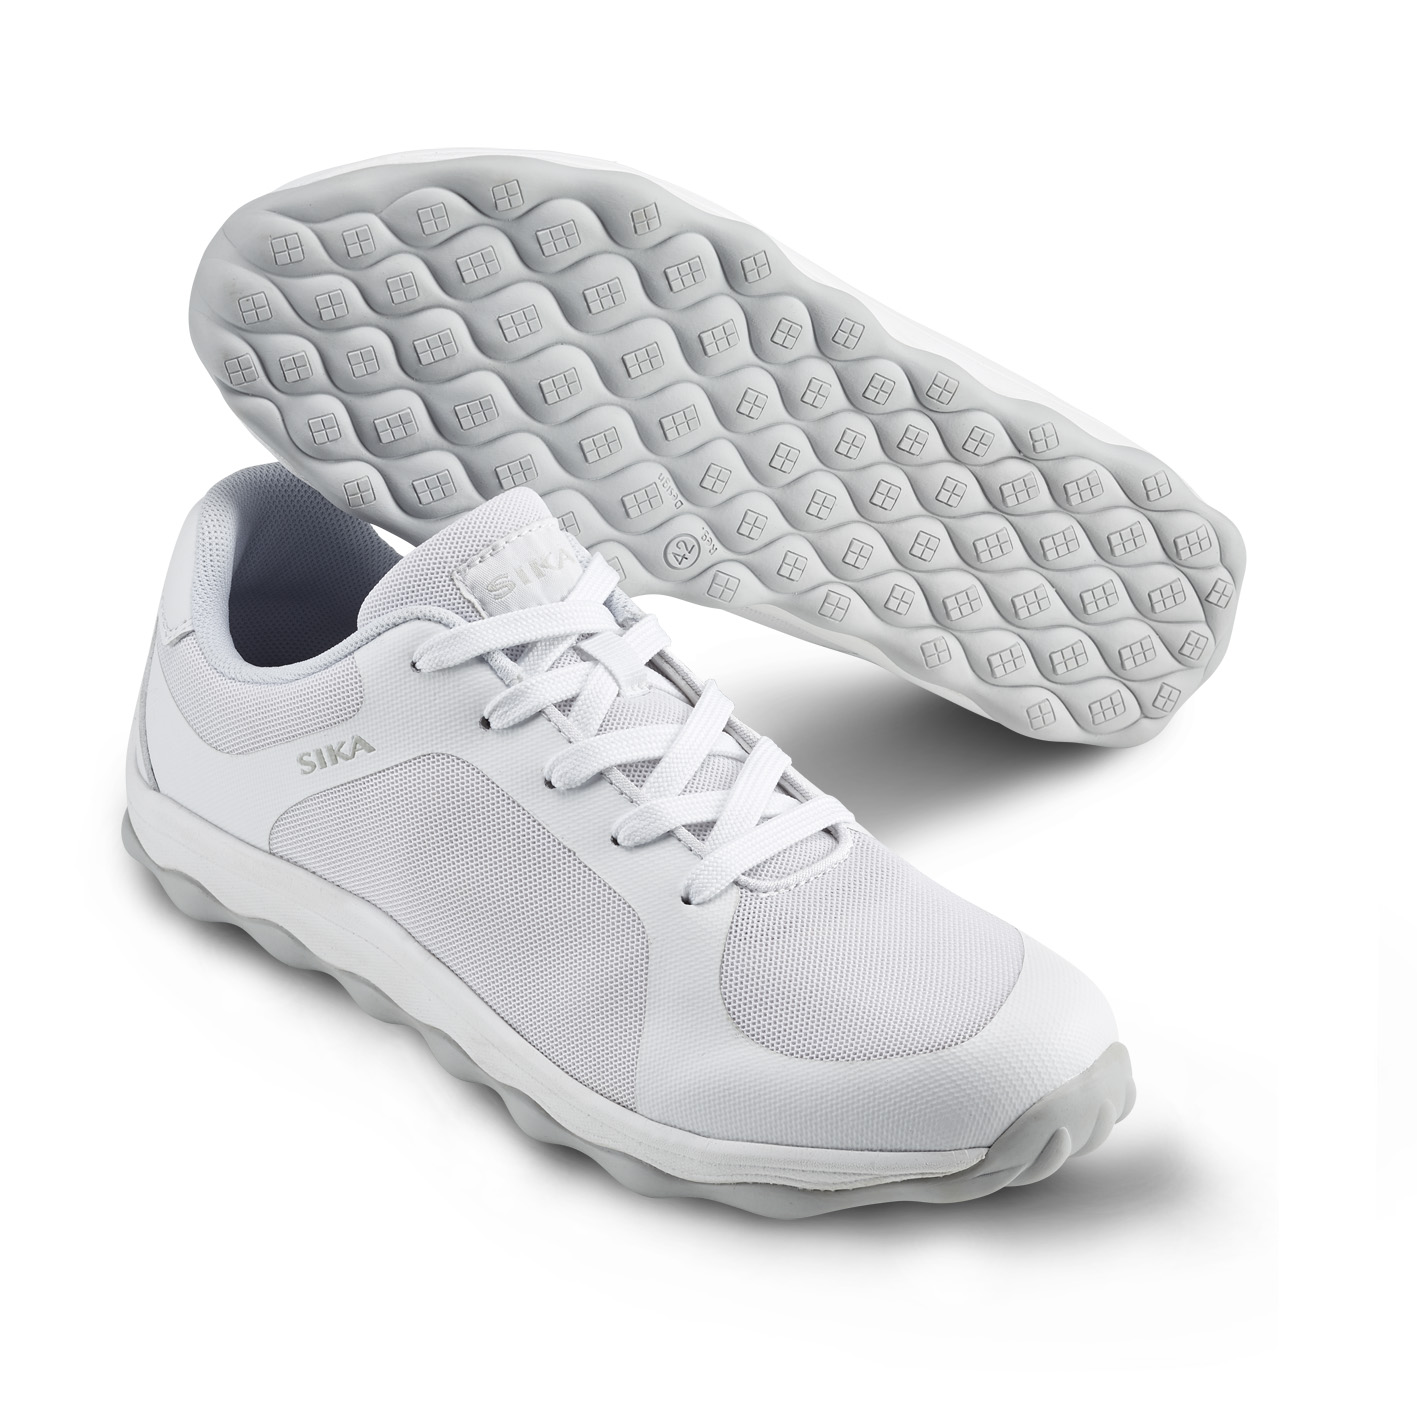 Mjuk arbetssko i sneakersmodell Vit (41)